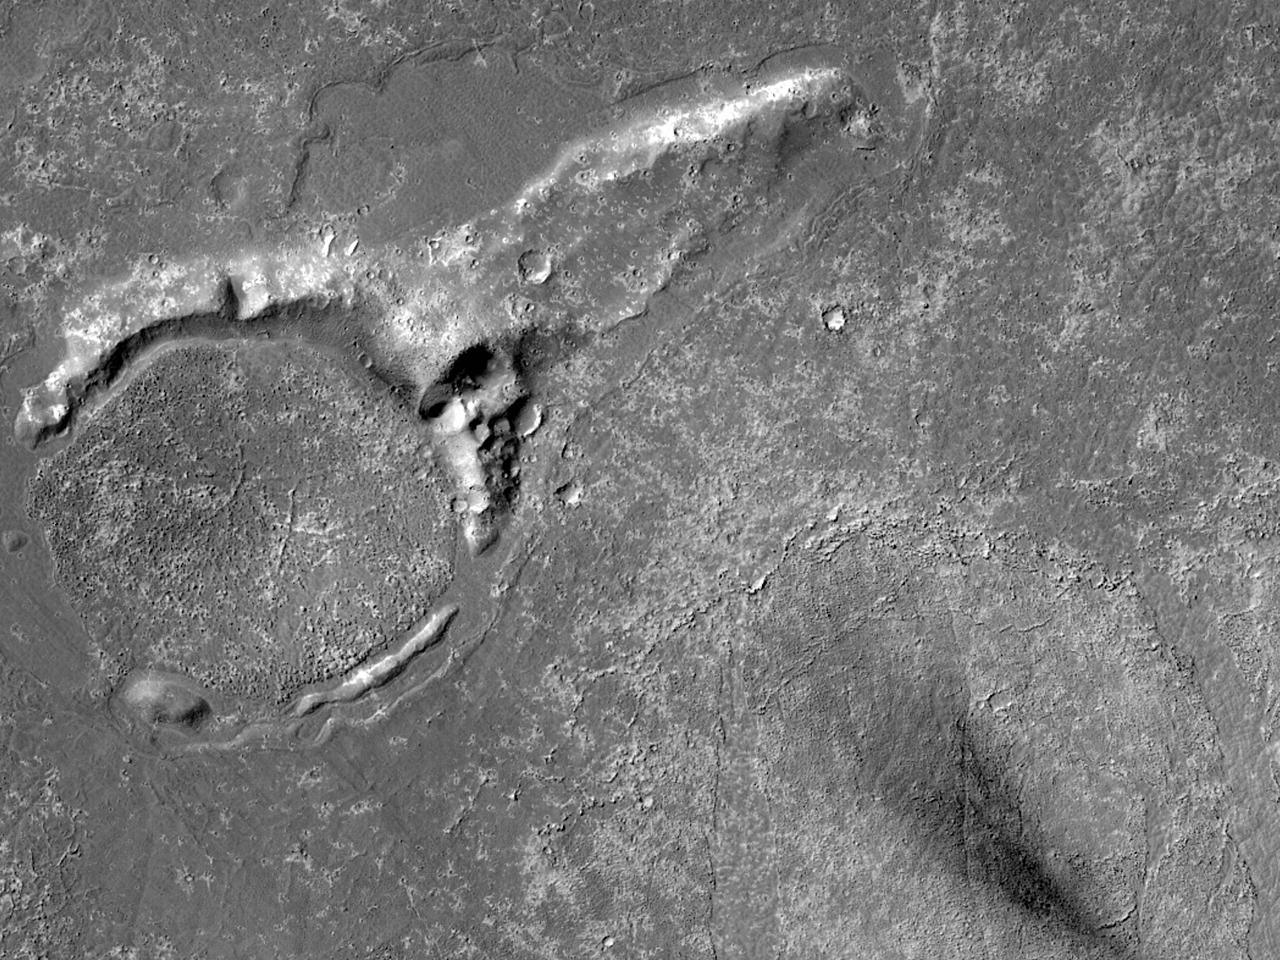 Лавовая корка на западе равнины Elysium Planitia